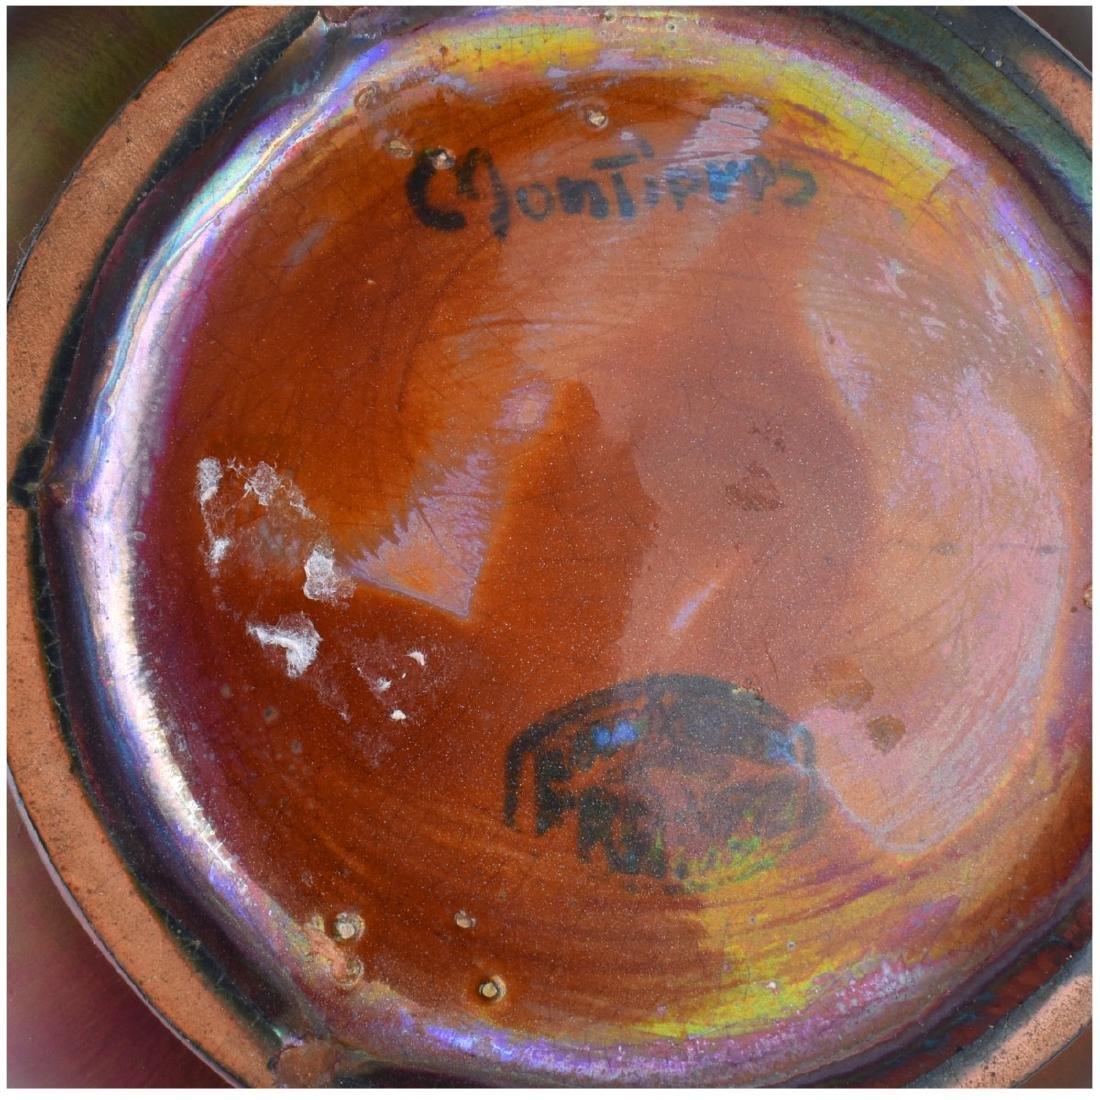 Montieres French Iridescent Art Pottery Vase - 5